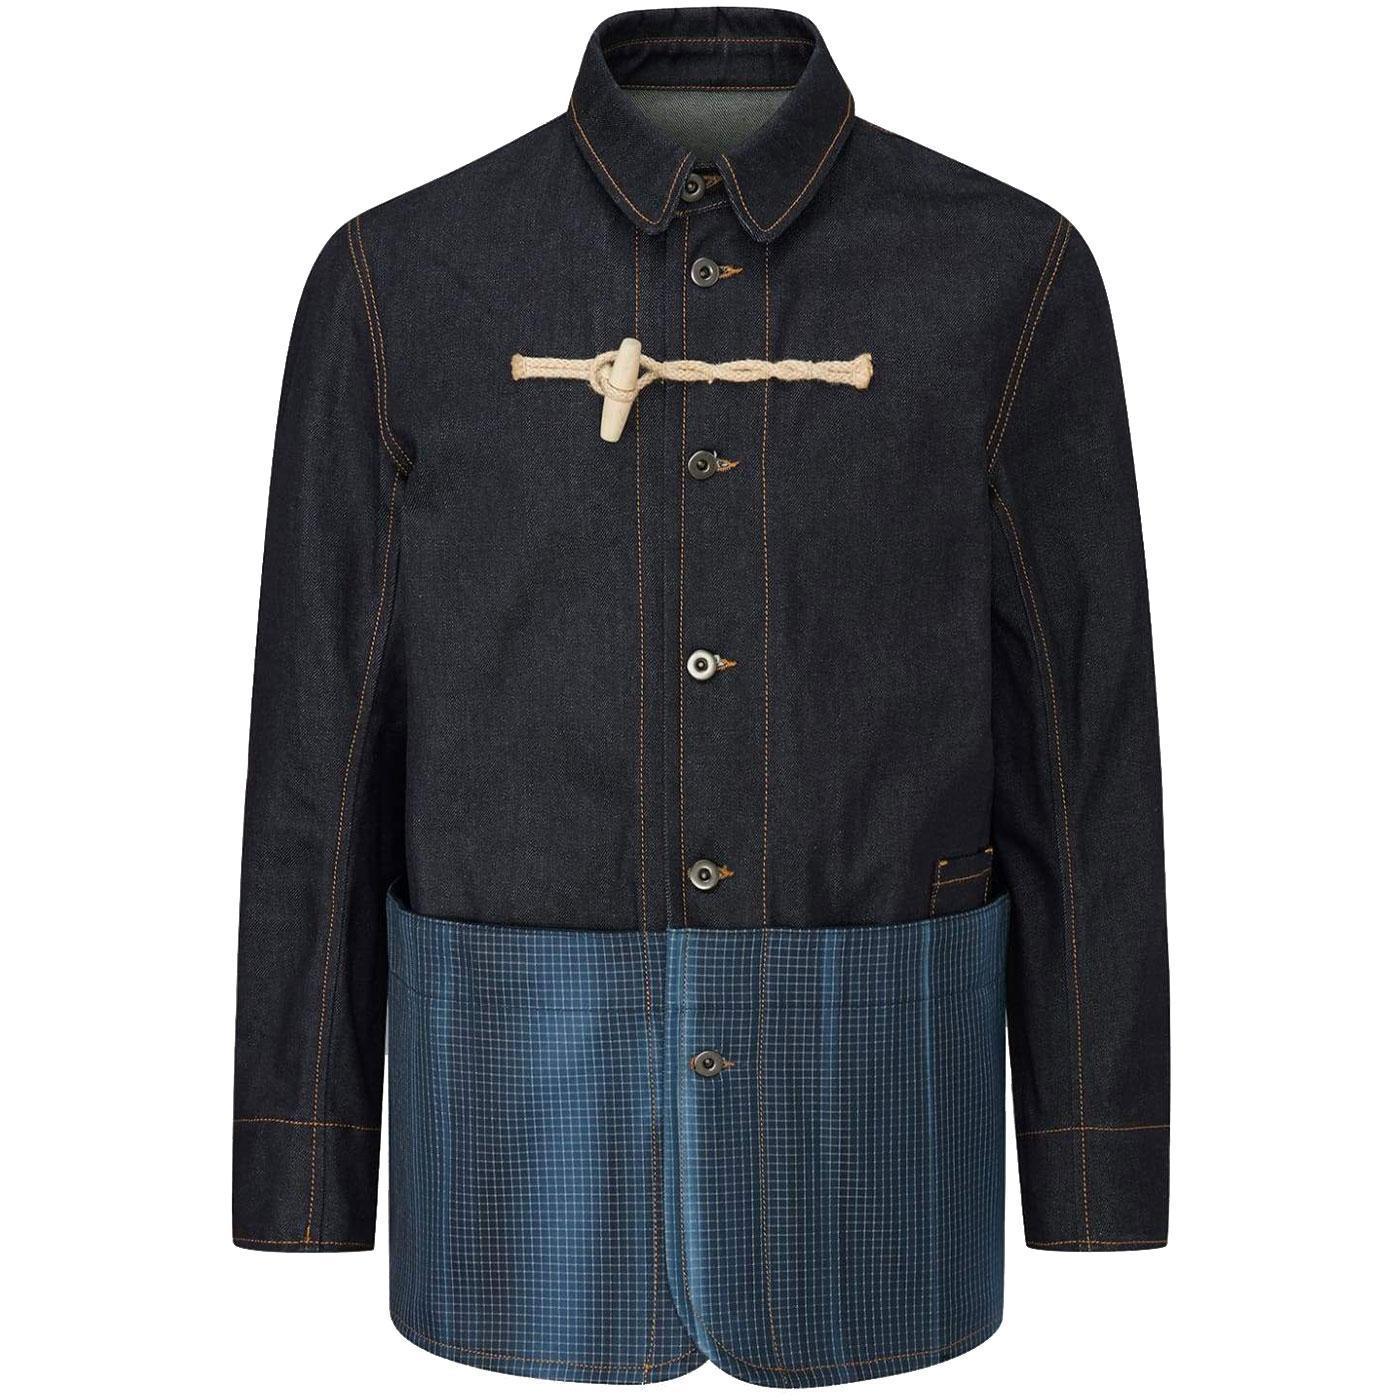 GLOVERALL X ULLAC Men's Denim Painter Jacket